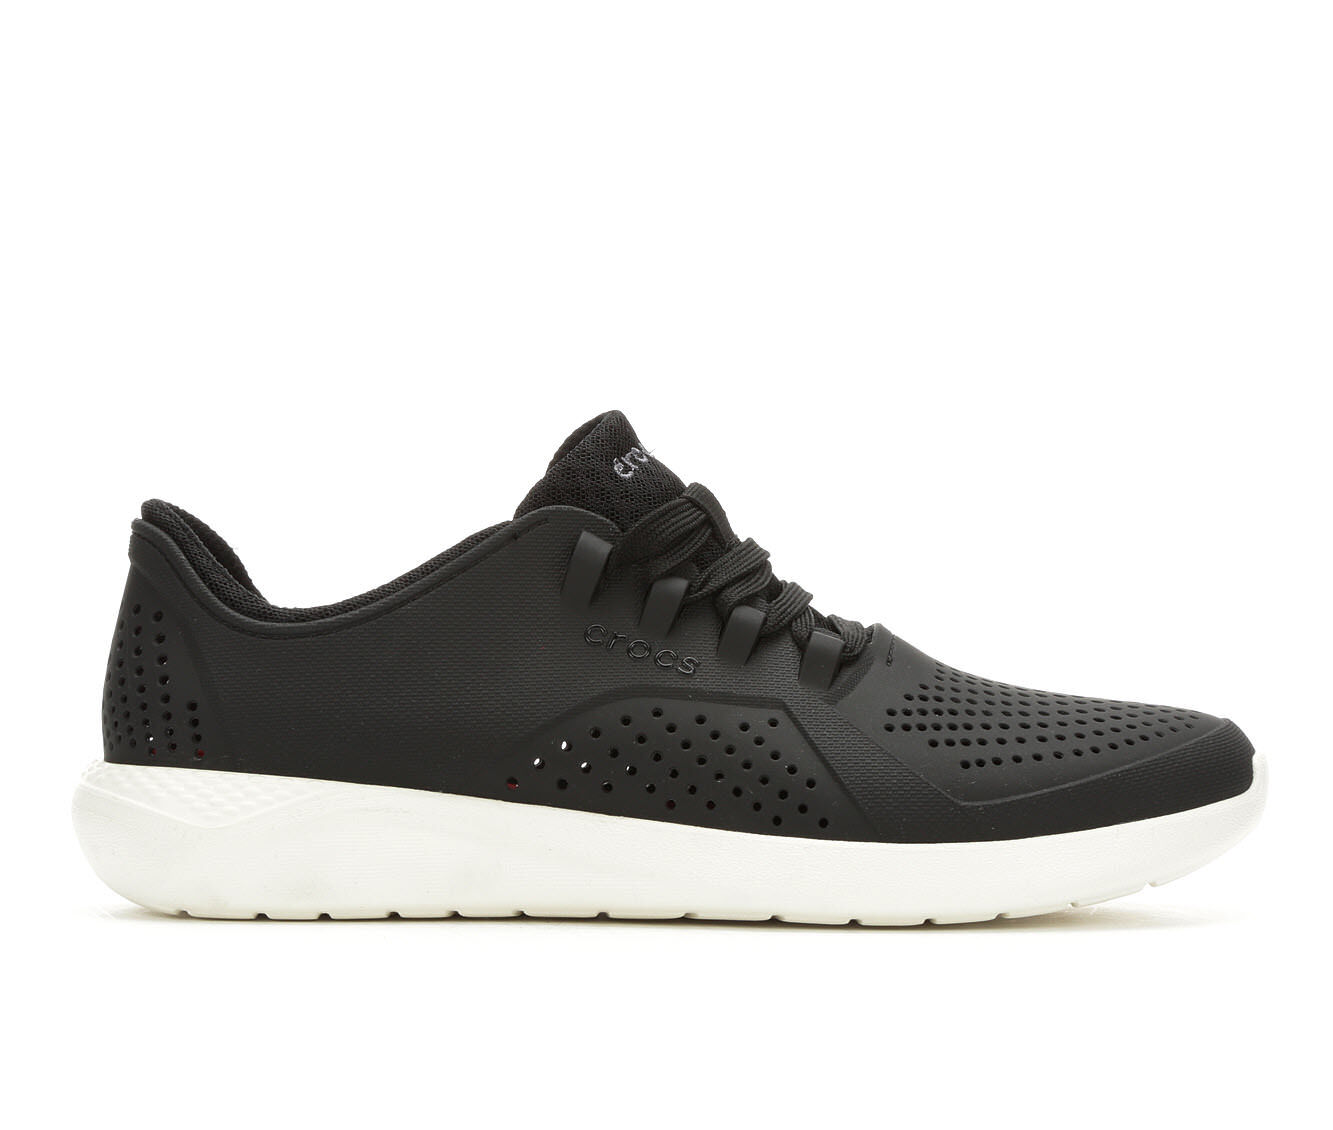 purchase comfortable Men's Crocs LiteRide Pacer Black/White